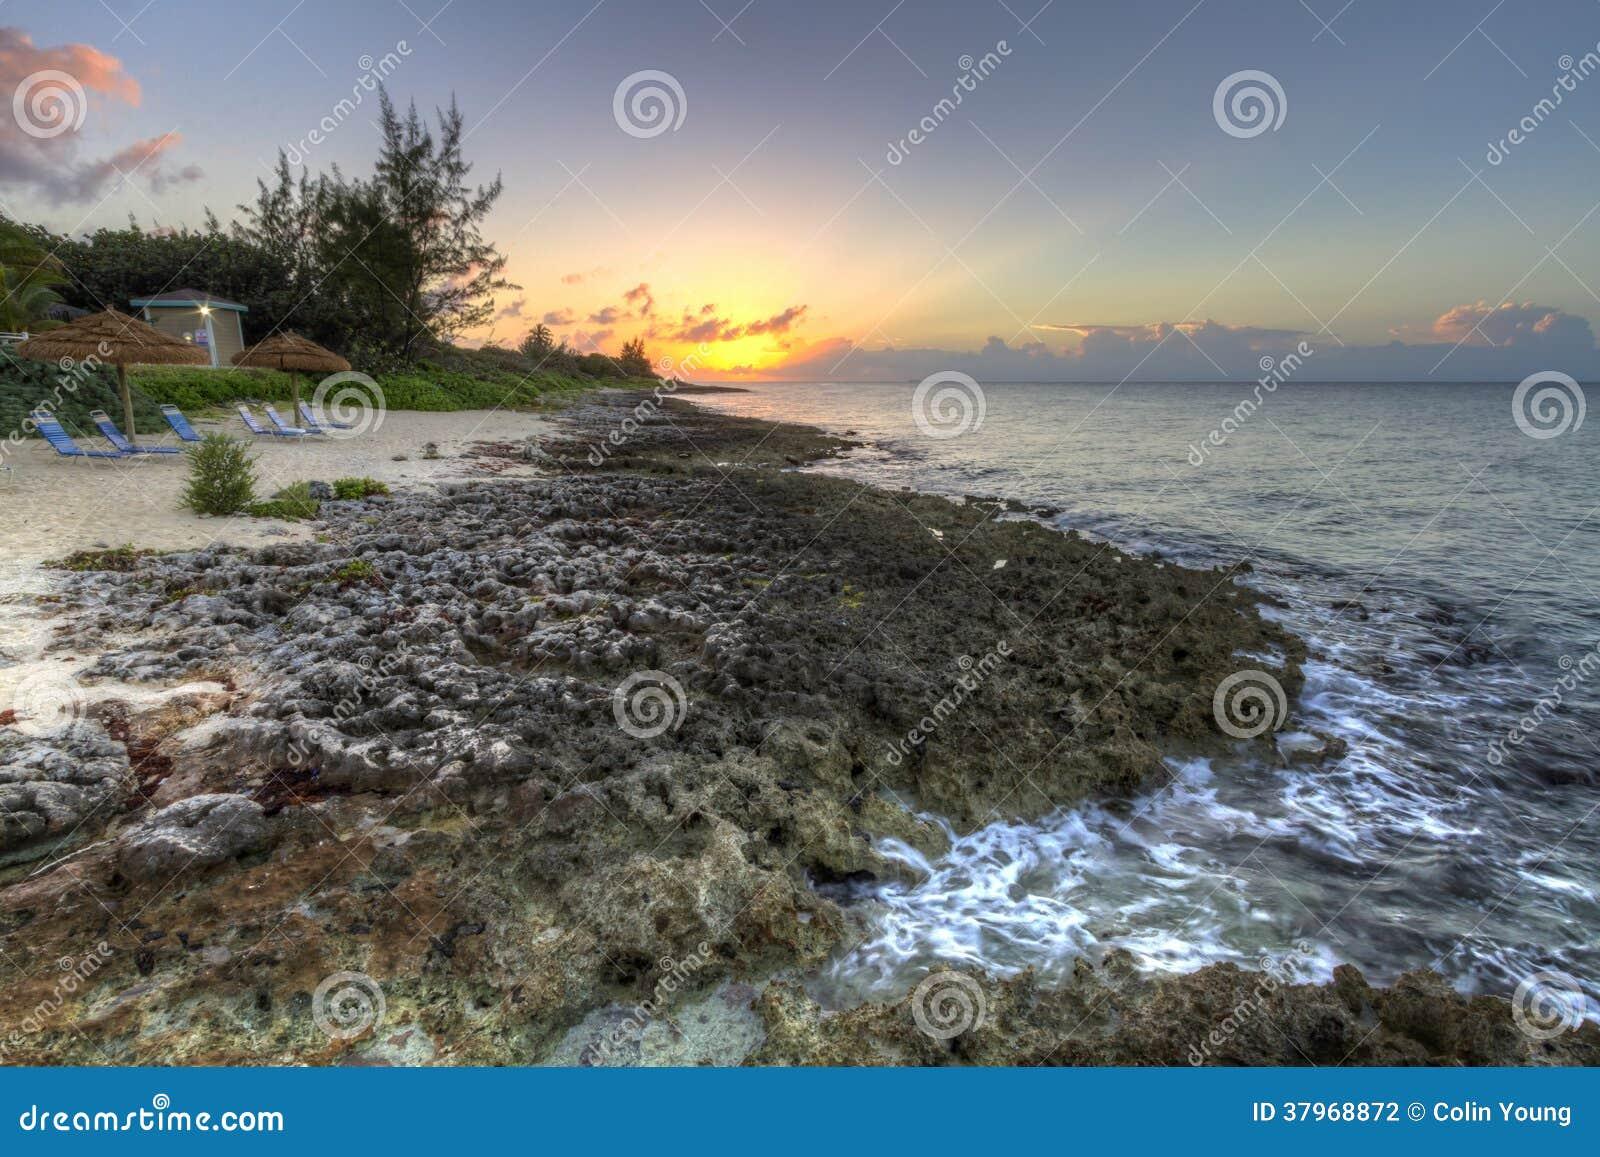 Grand Cayman Craggy Coast Sunset